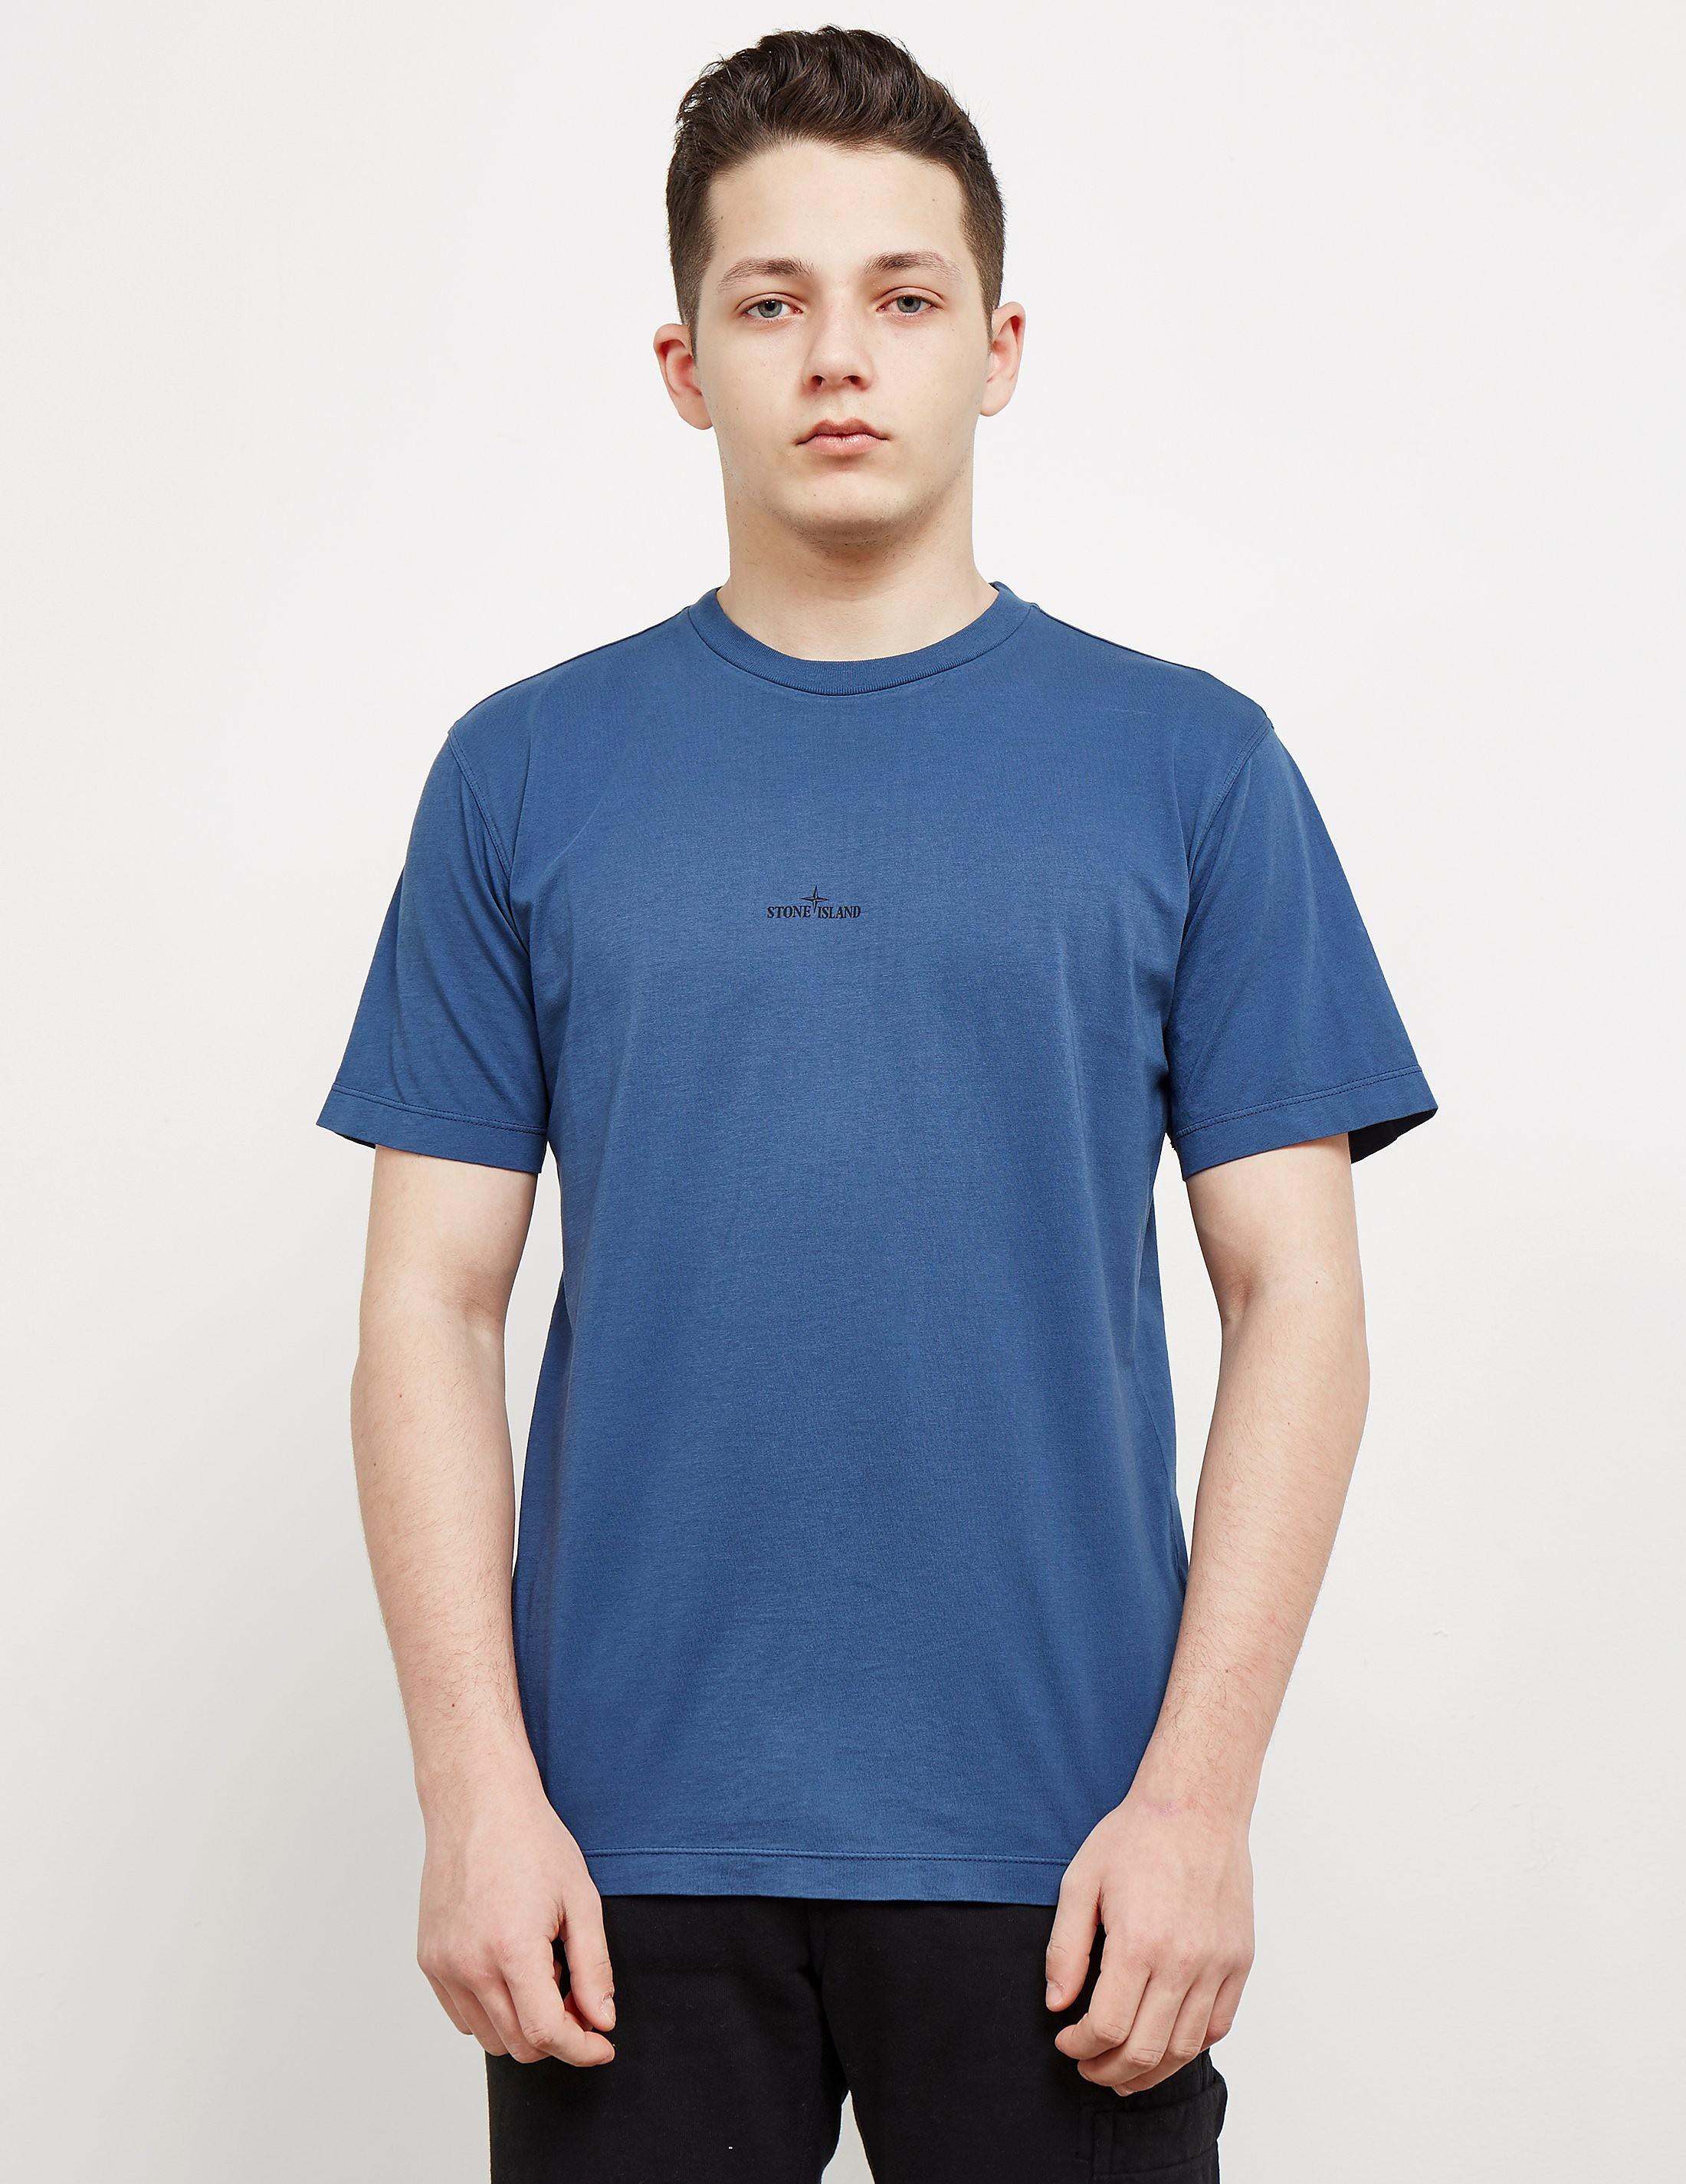 Stone Island Back Pin Short Sleeve T-Shirt